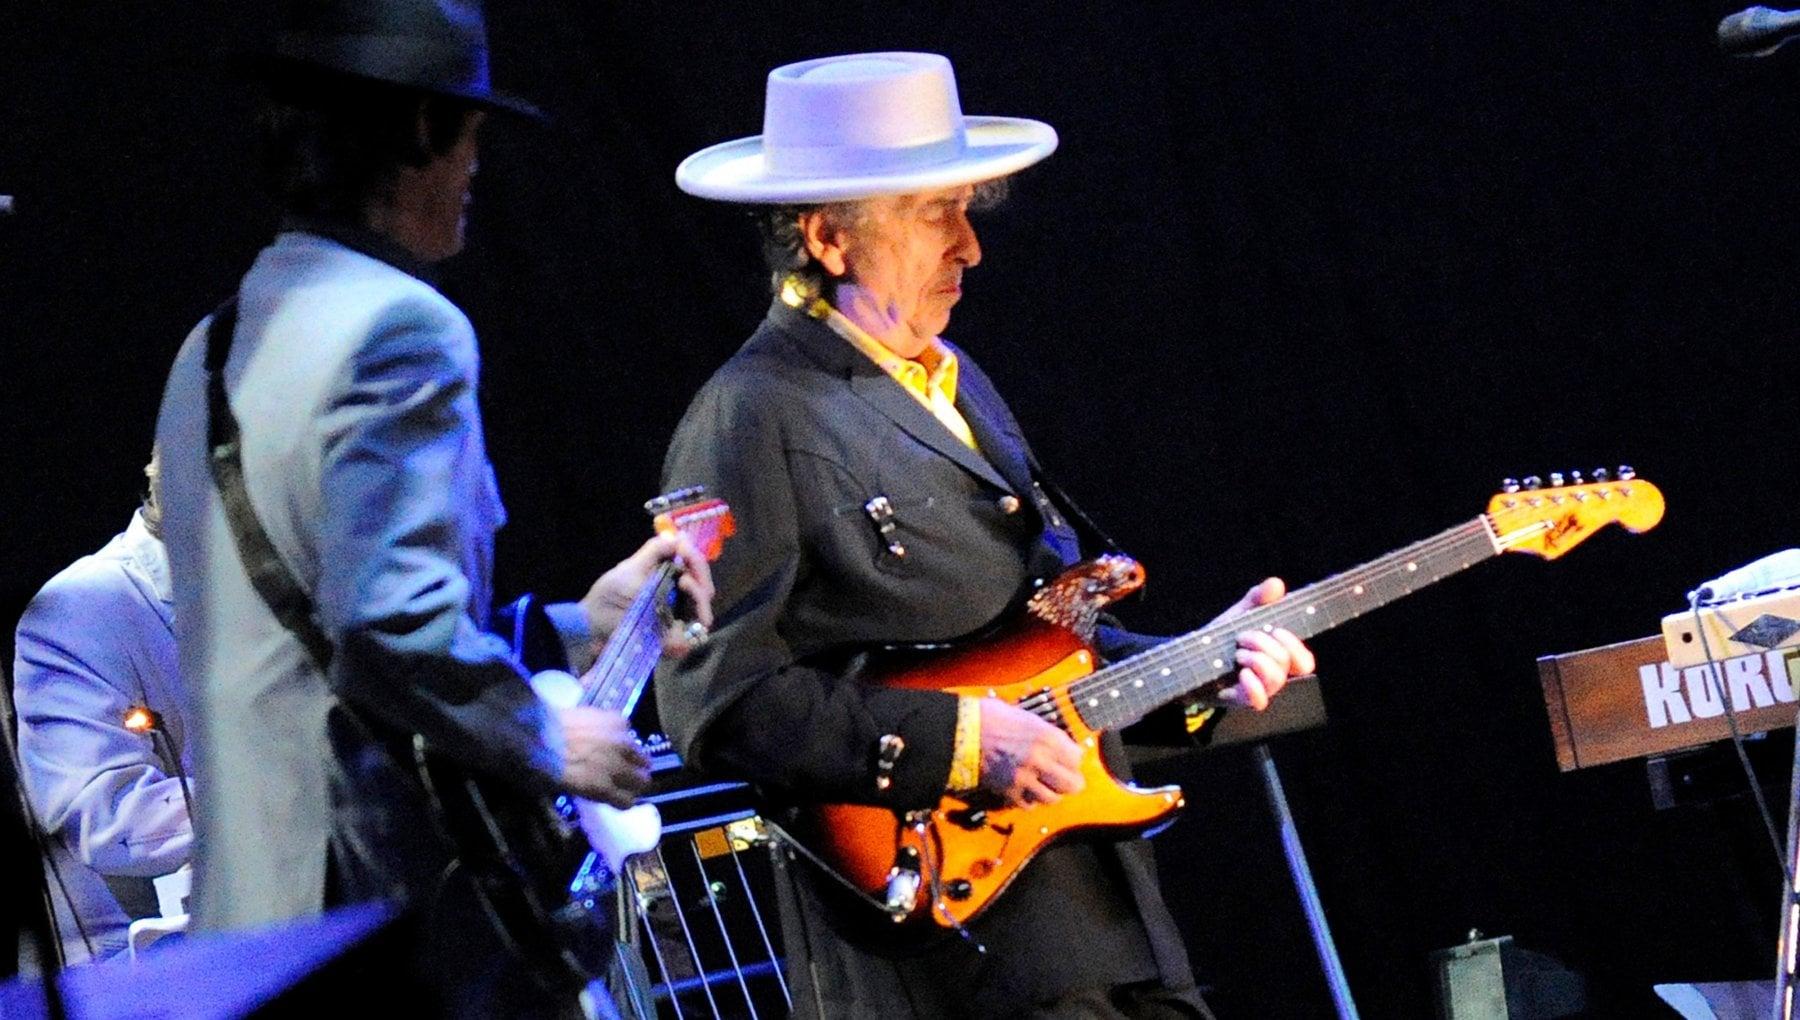 034659479 2bf43bb8 ce6e 494c 9ee9 2238dde9d2a0 - Bob Dylan citato in giudizio per una presunta violenza del 1965 su una minorenne